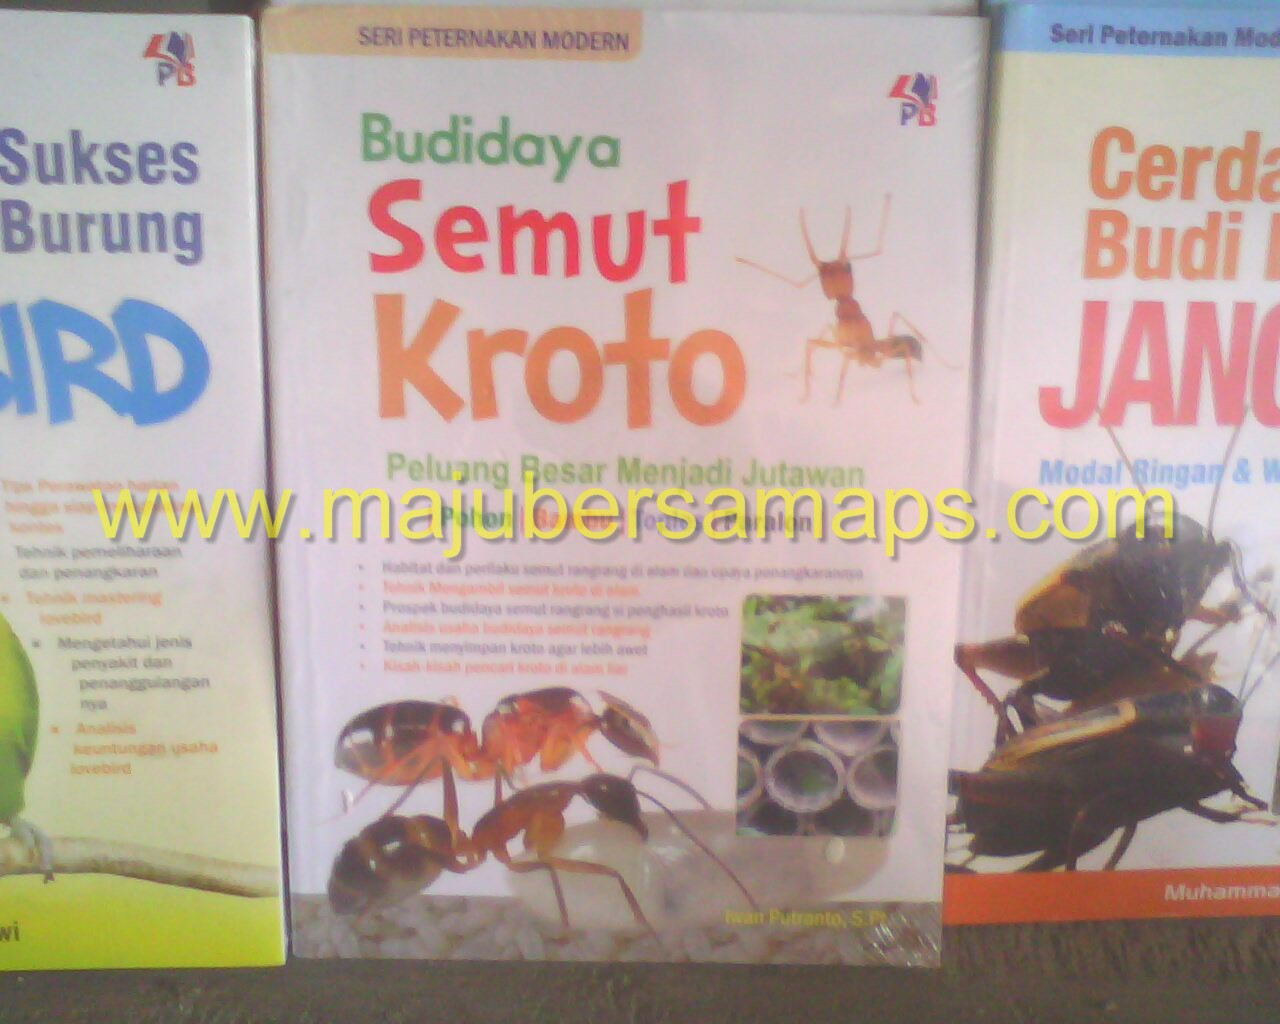 ... Buku Peternakan Online : SERI PETERNAKAN MODERN BUDIDAYA SEMUT KROTO